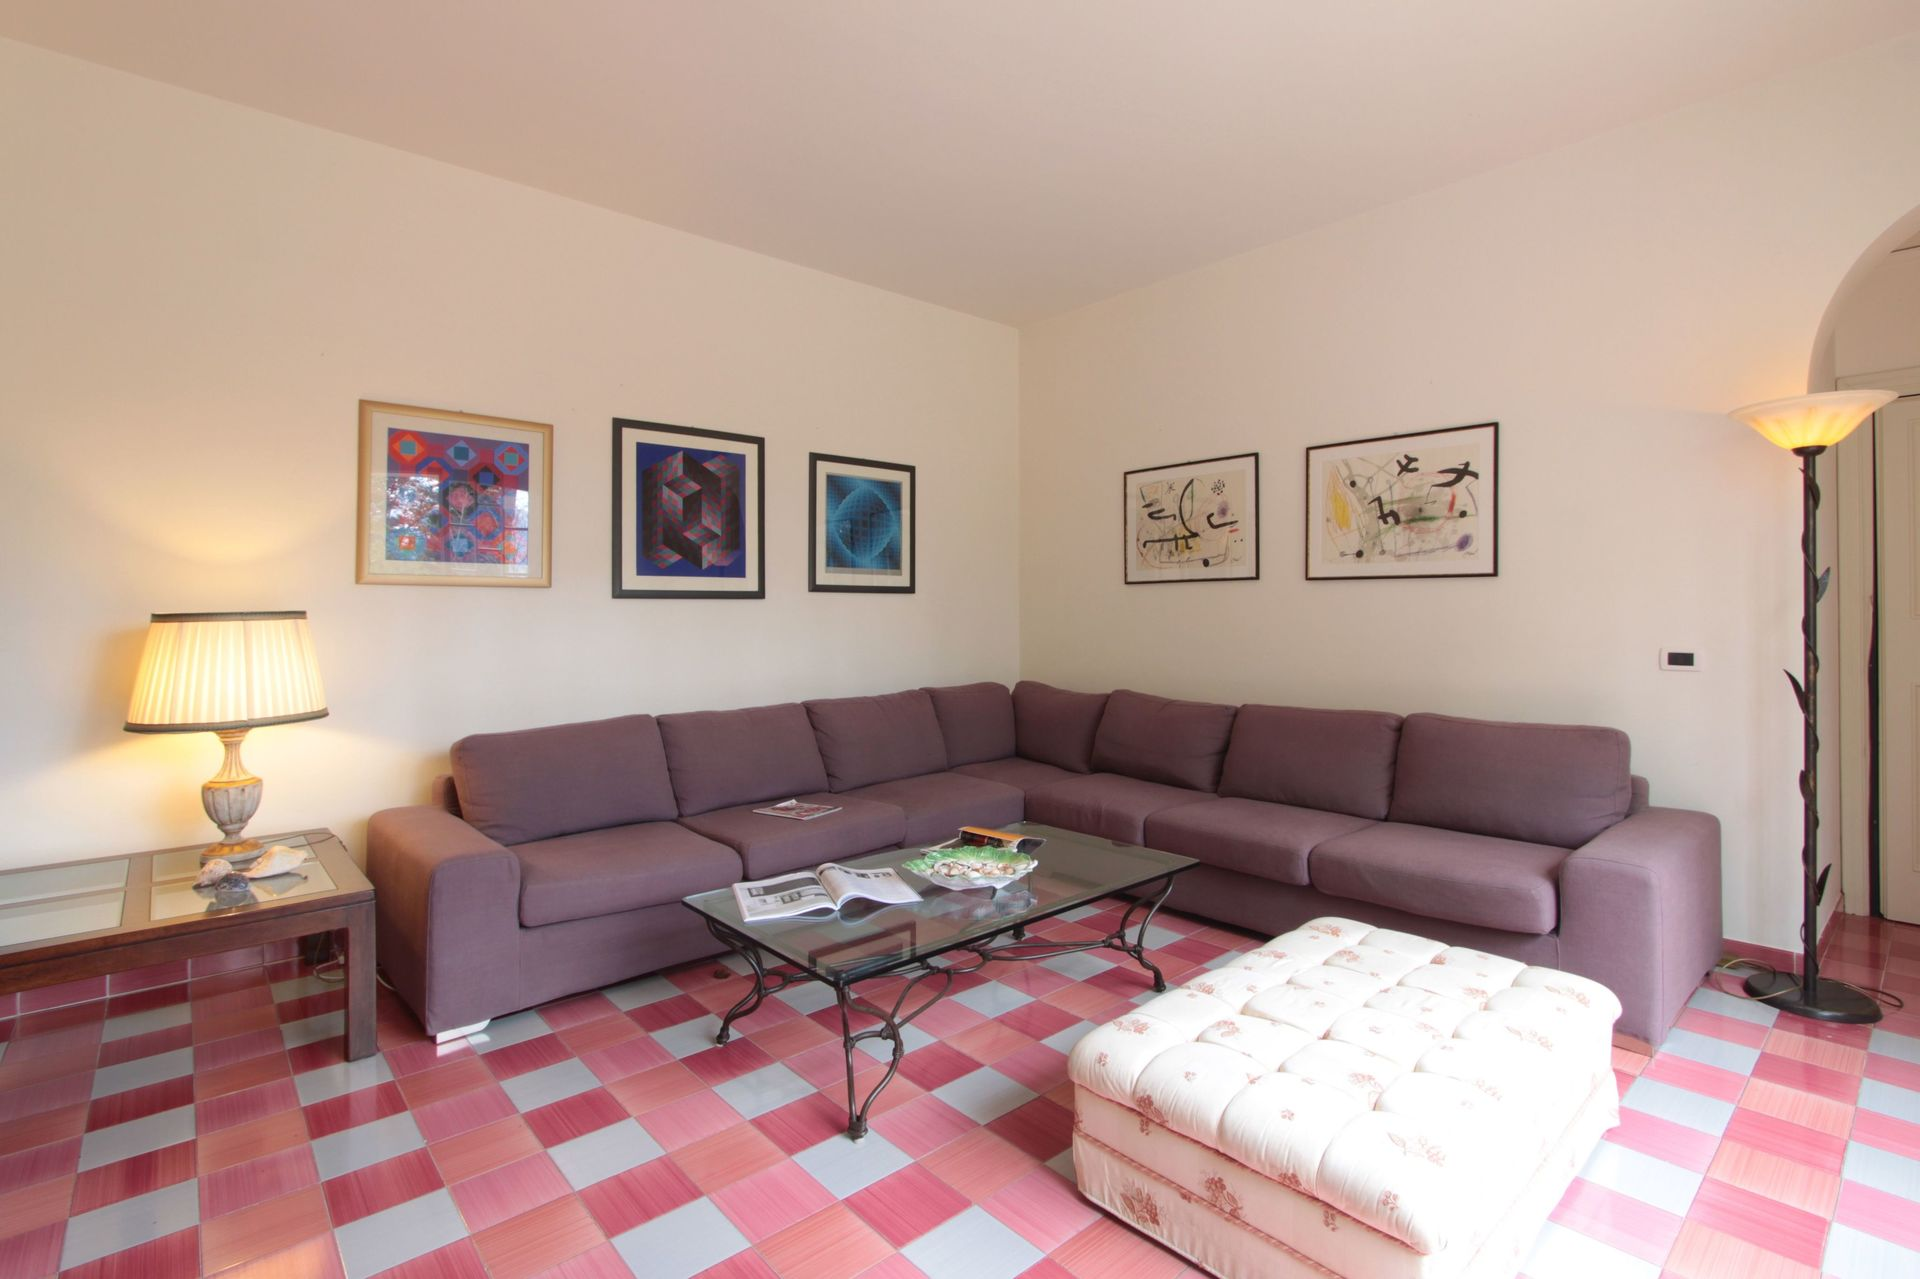 Villa Terre Du Sud the park: vacation rental that sleeps 12 people in 6